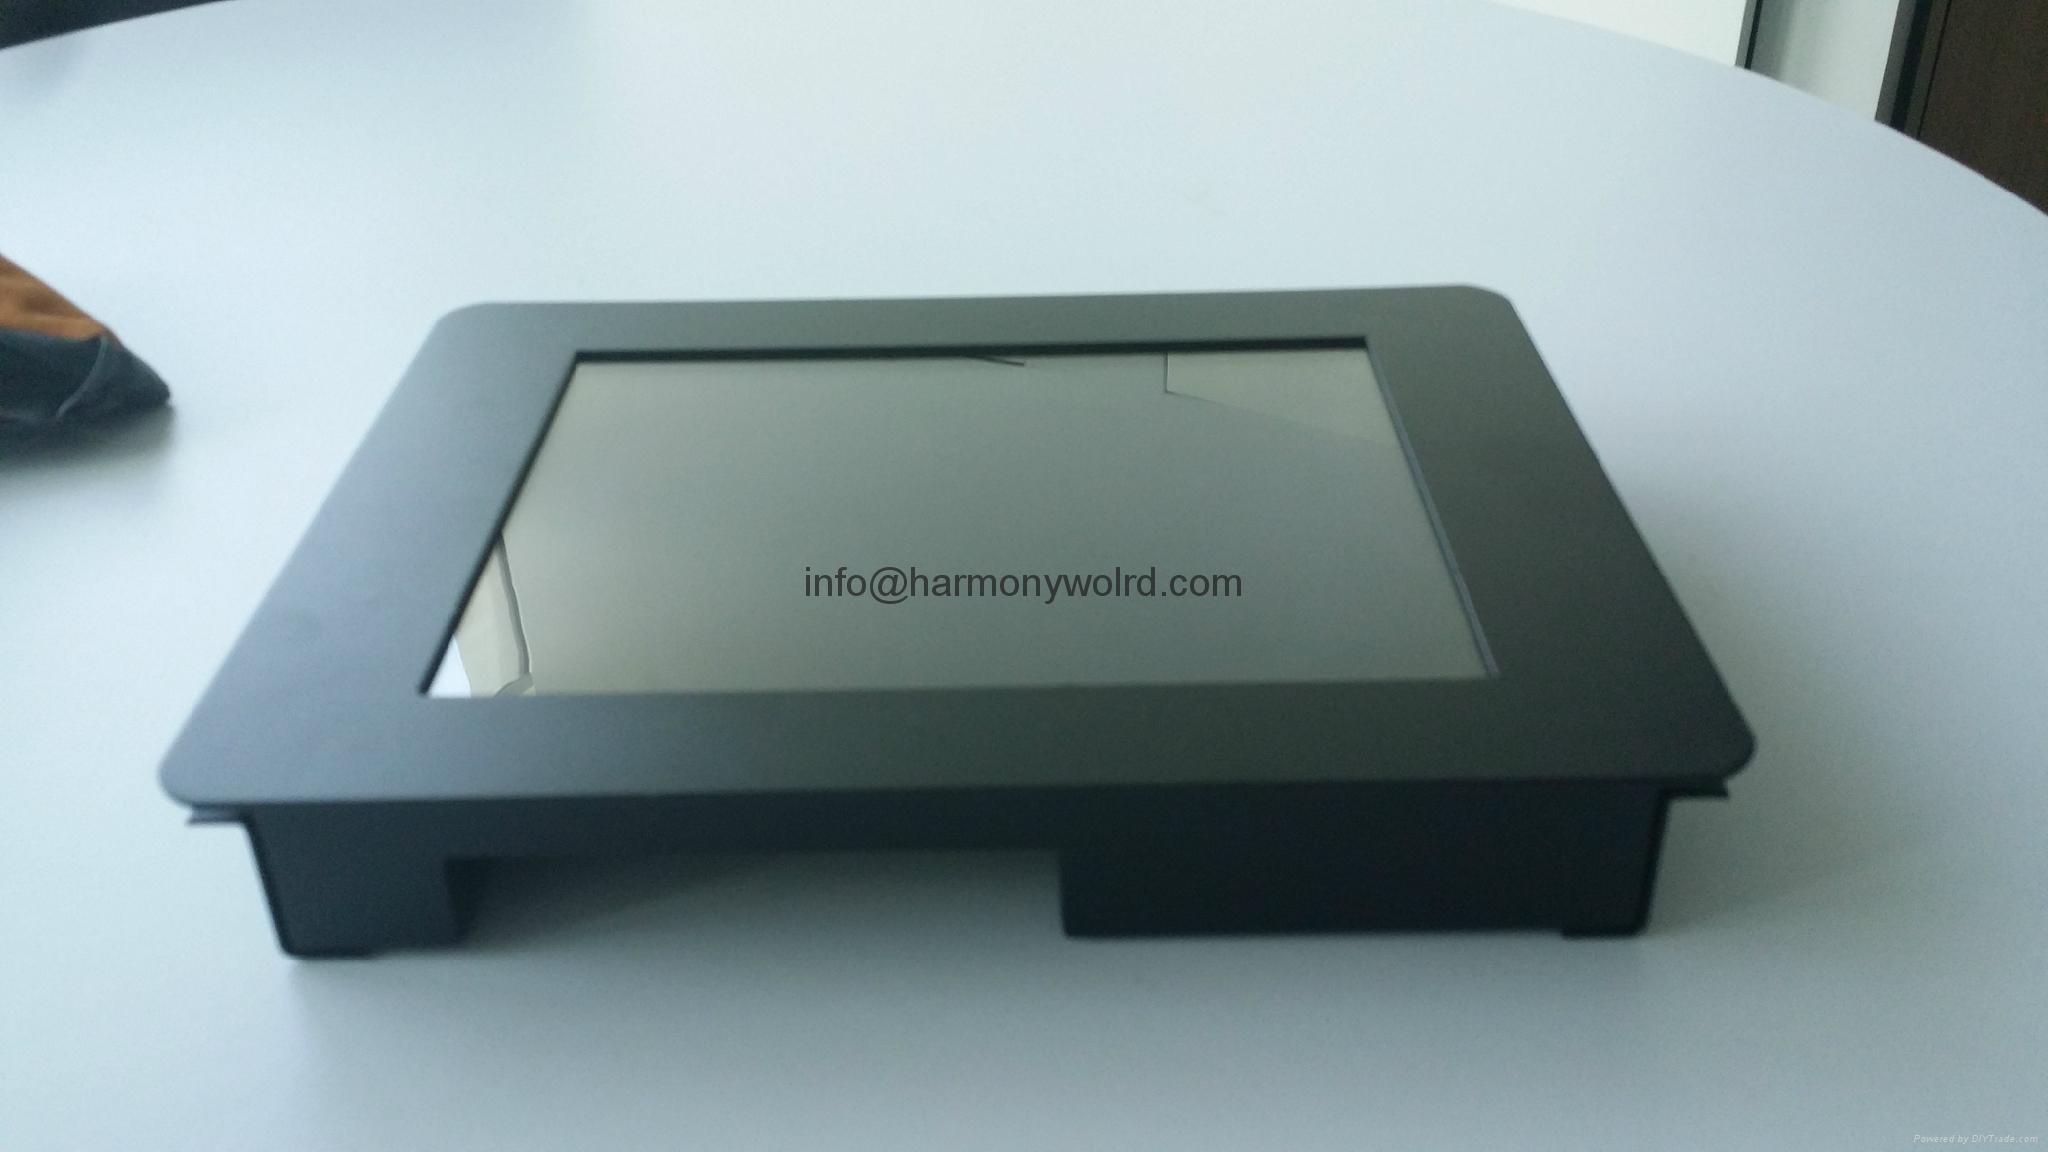 Upgrade Okuma Monitor 5000-LSC 5000ASG 5000LG 5000LG-SC 5000LSG 5000mg-c 5000M   17